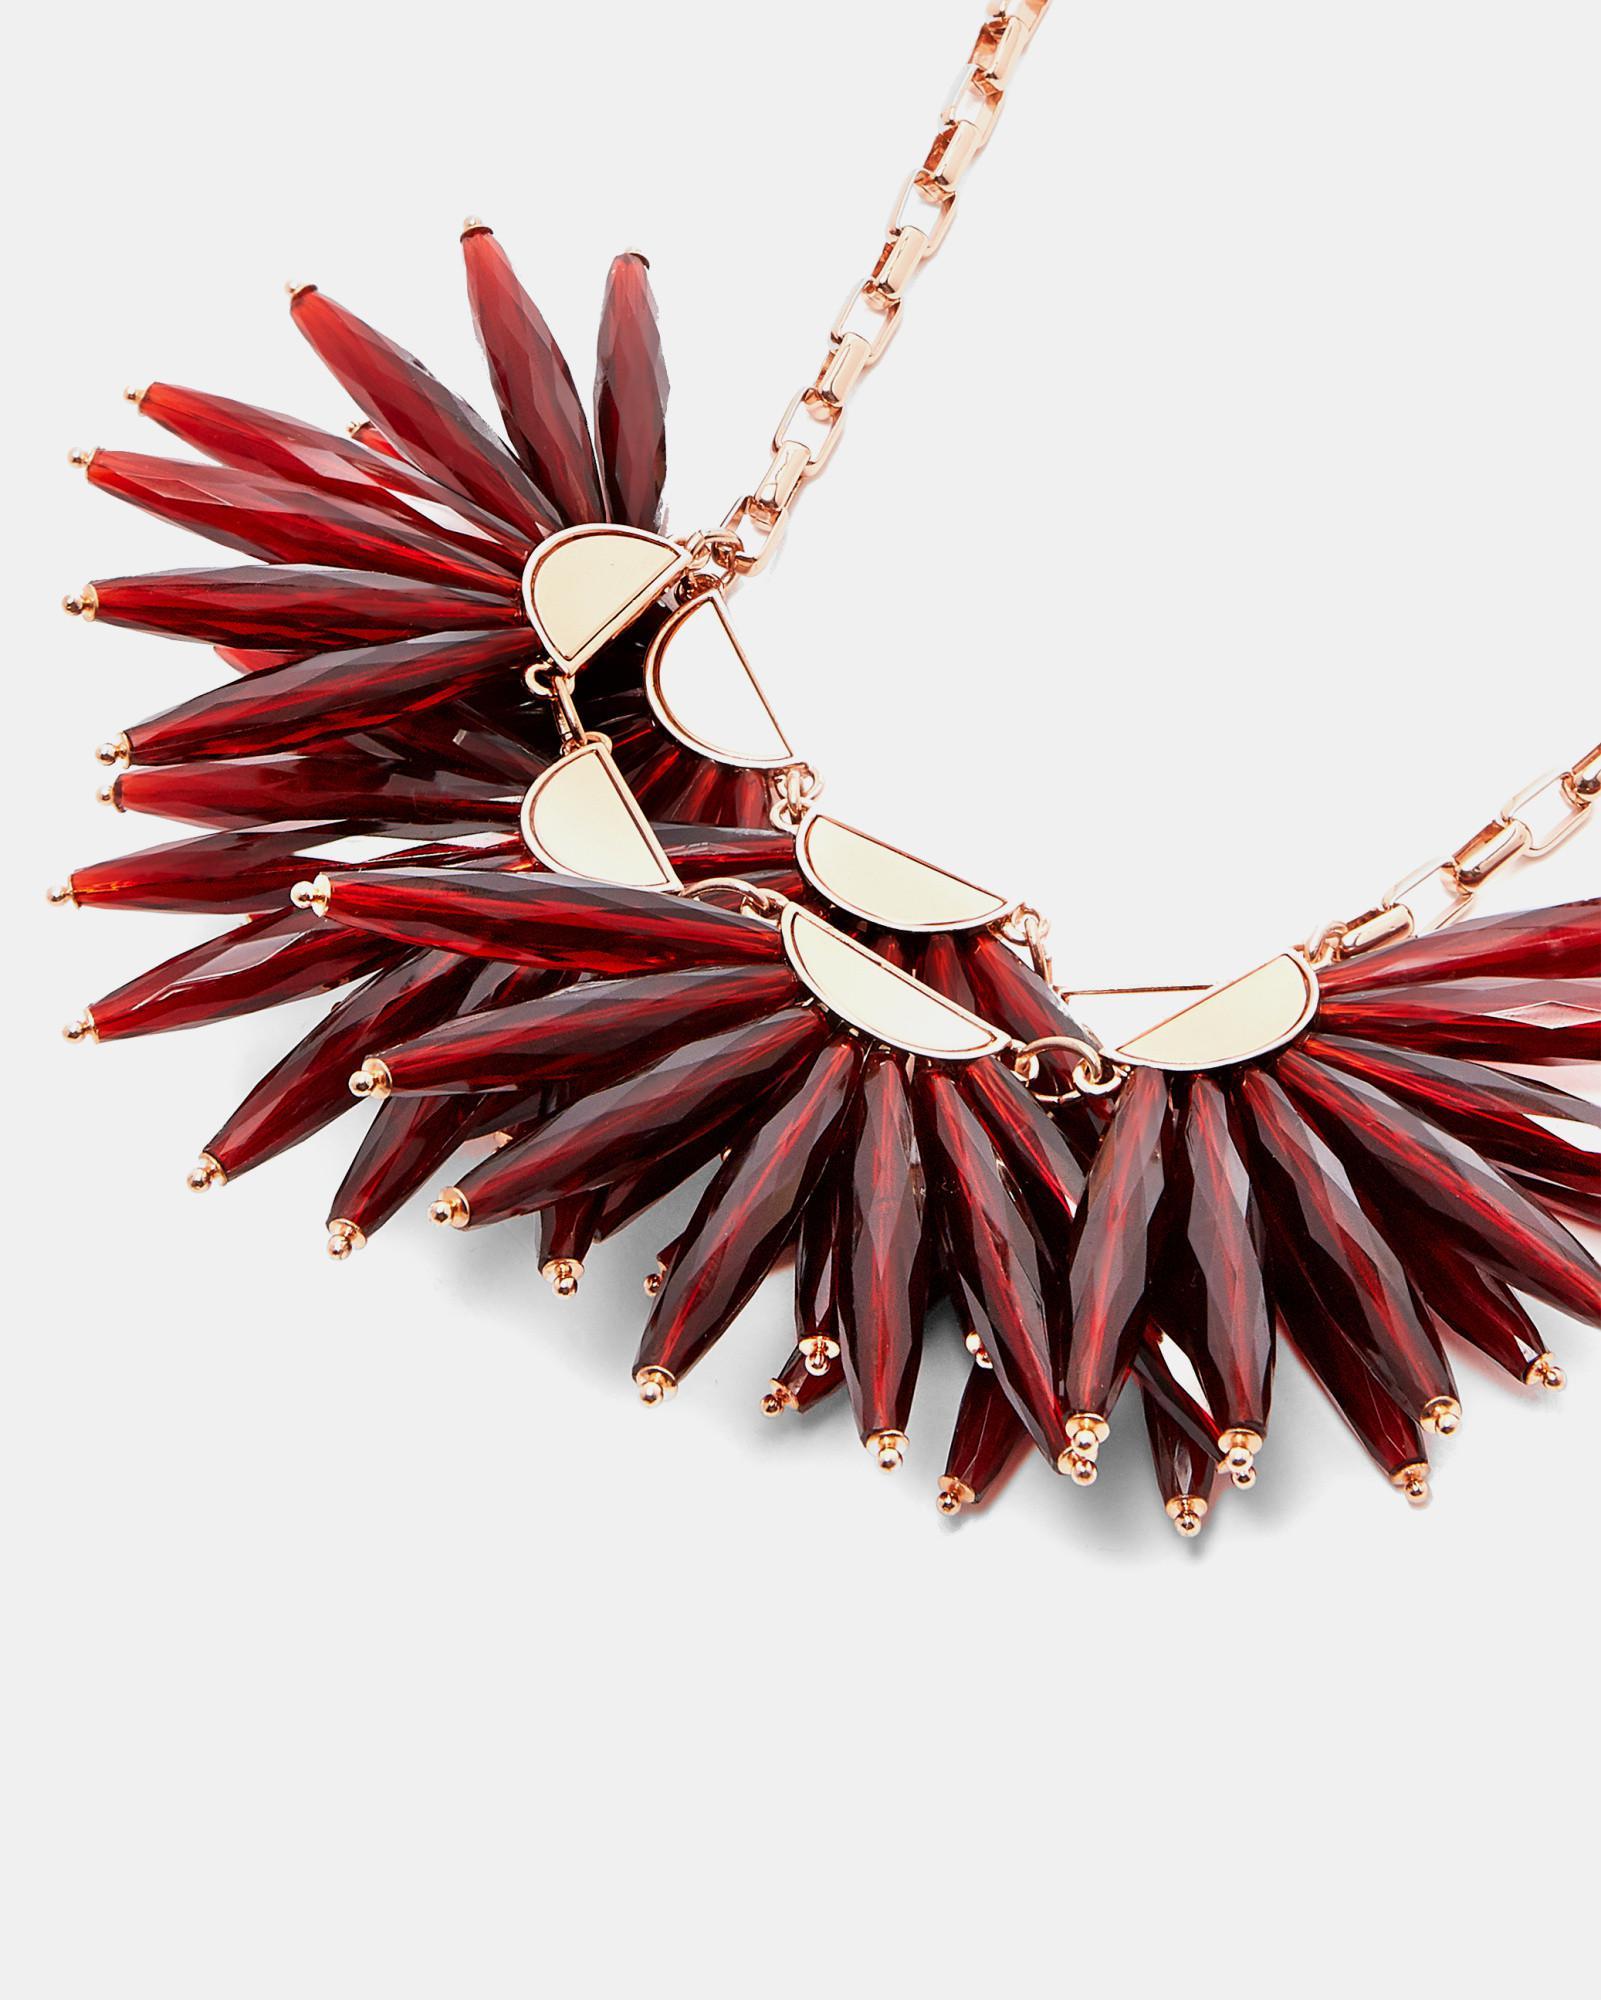 Ted Baker Flare Burst Necklace in Rose Gold/Red (Red)